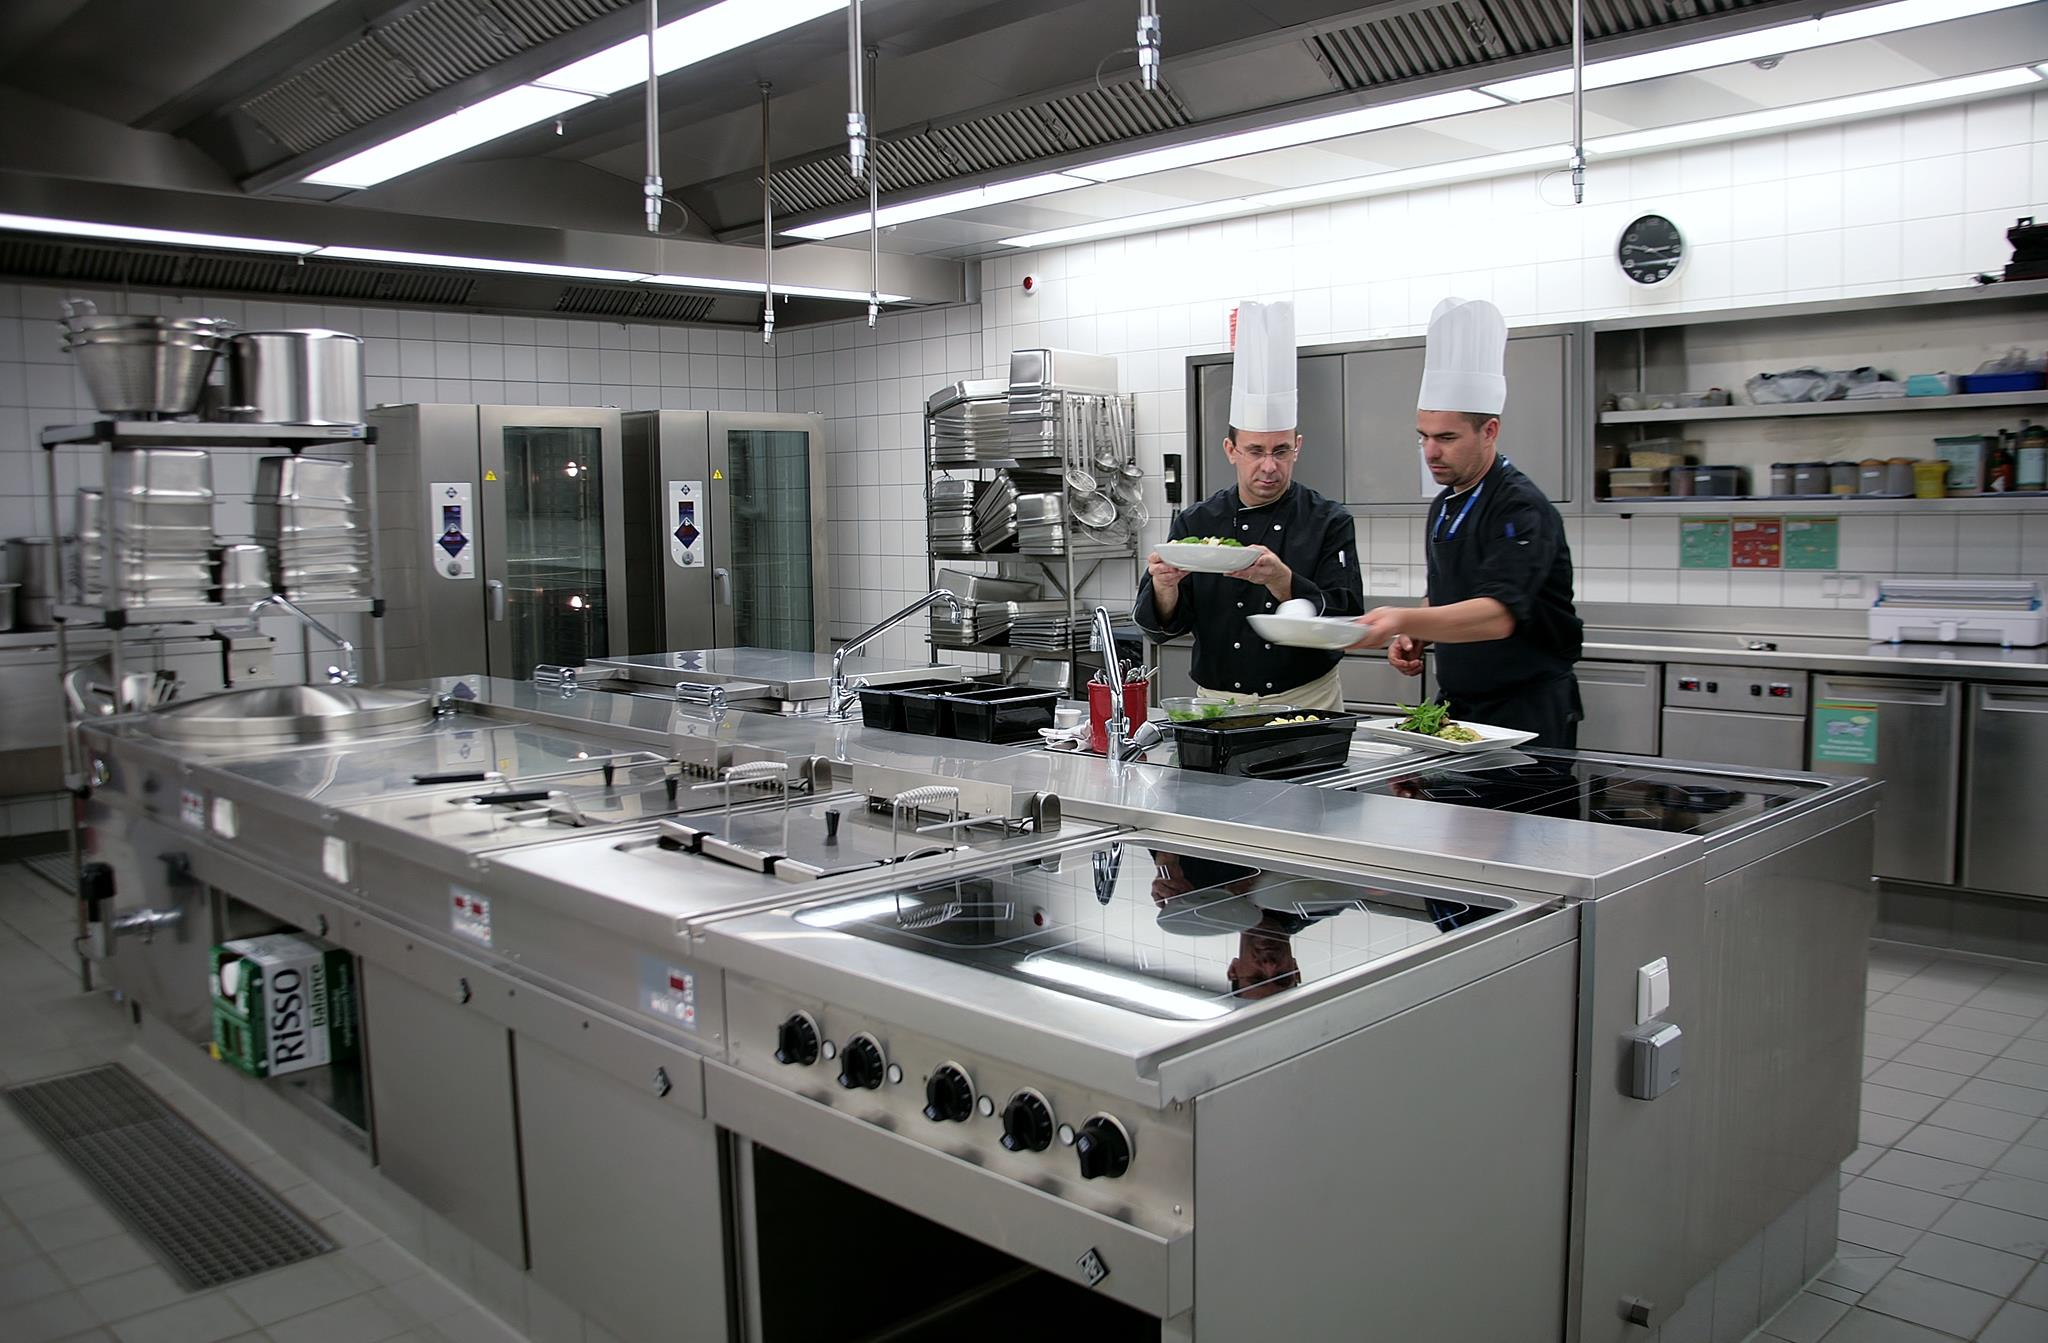 Küchen modular